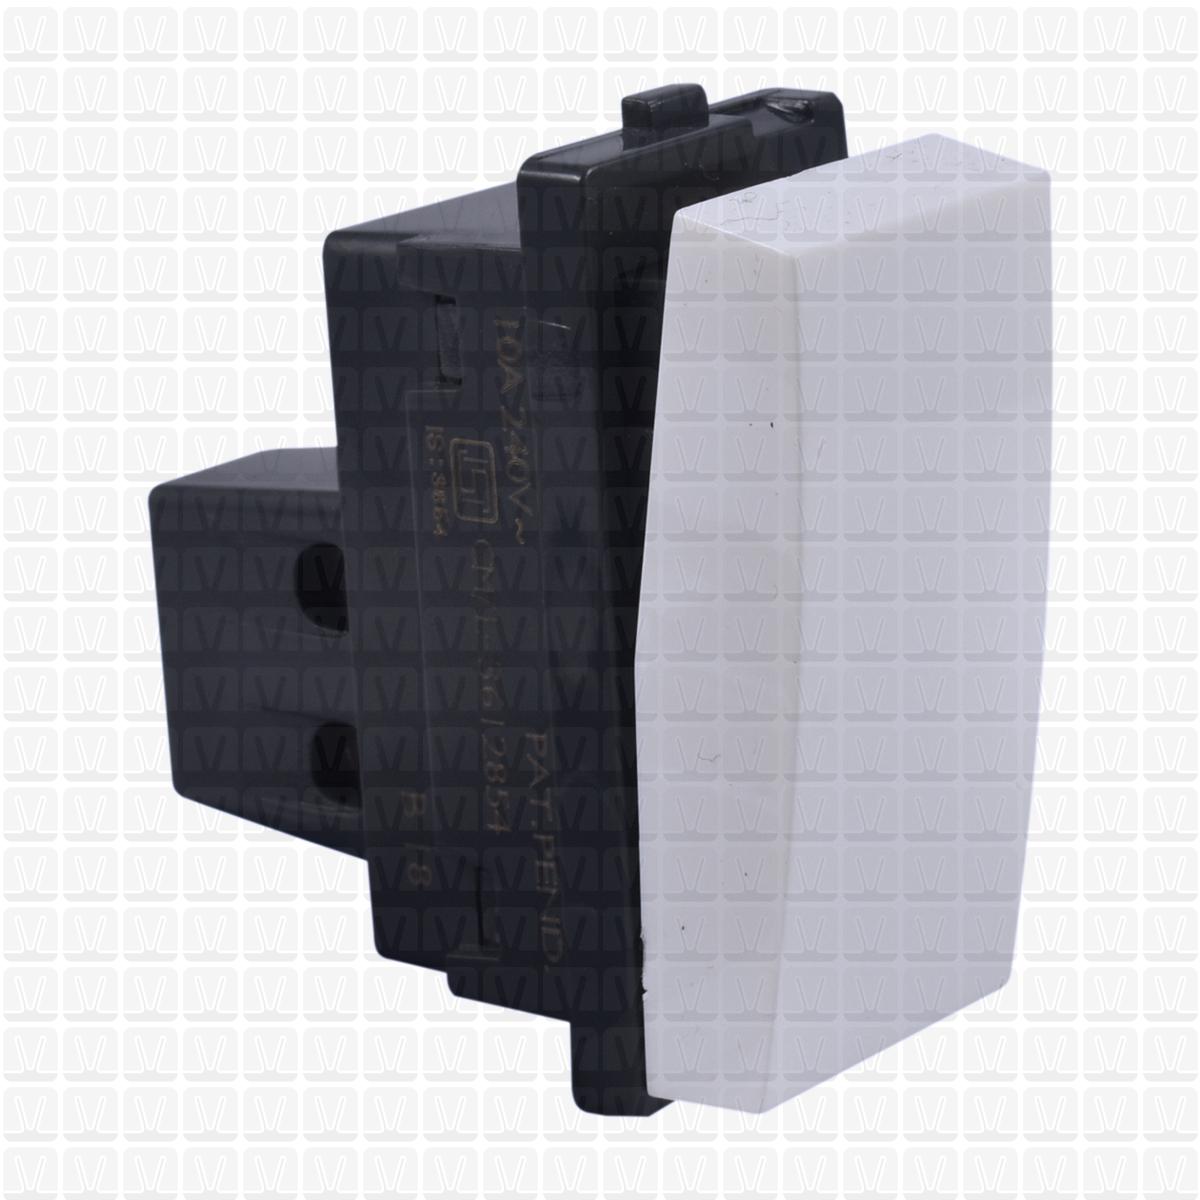 Fybros Favio One Way Switch 10 Amp Vardhman Shop Circuit